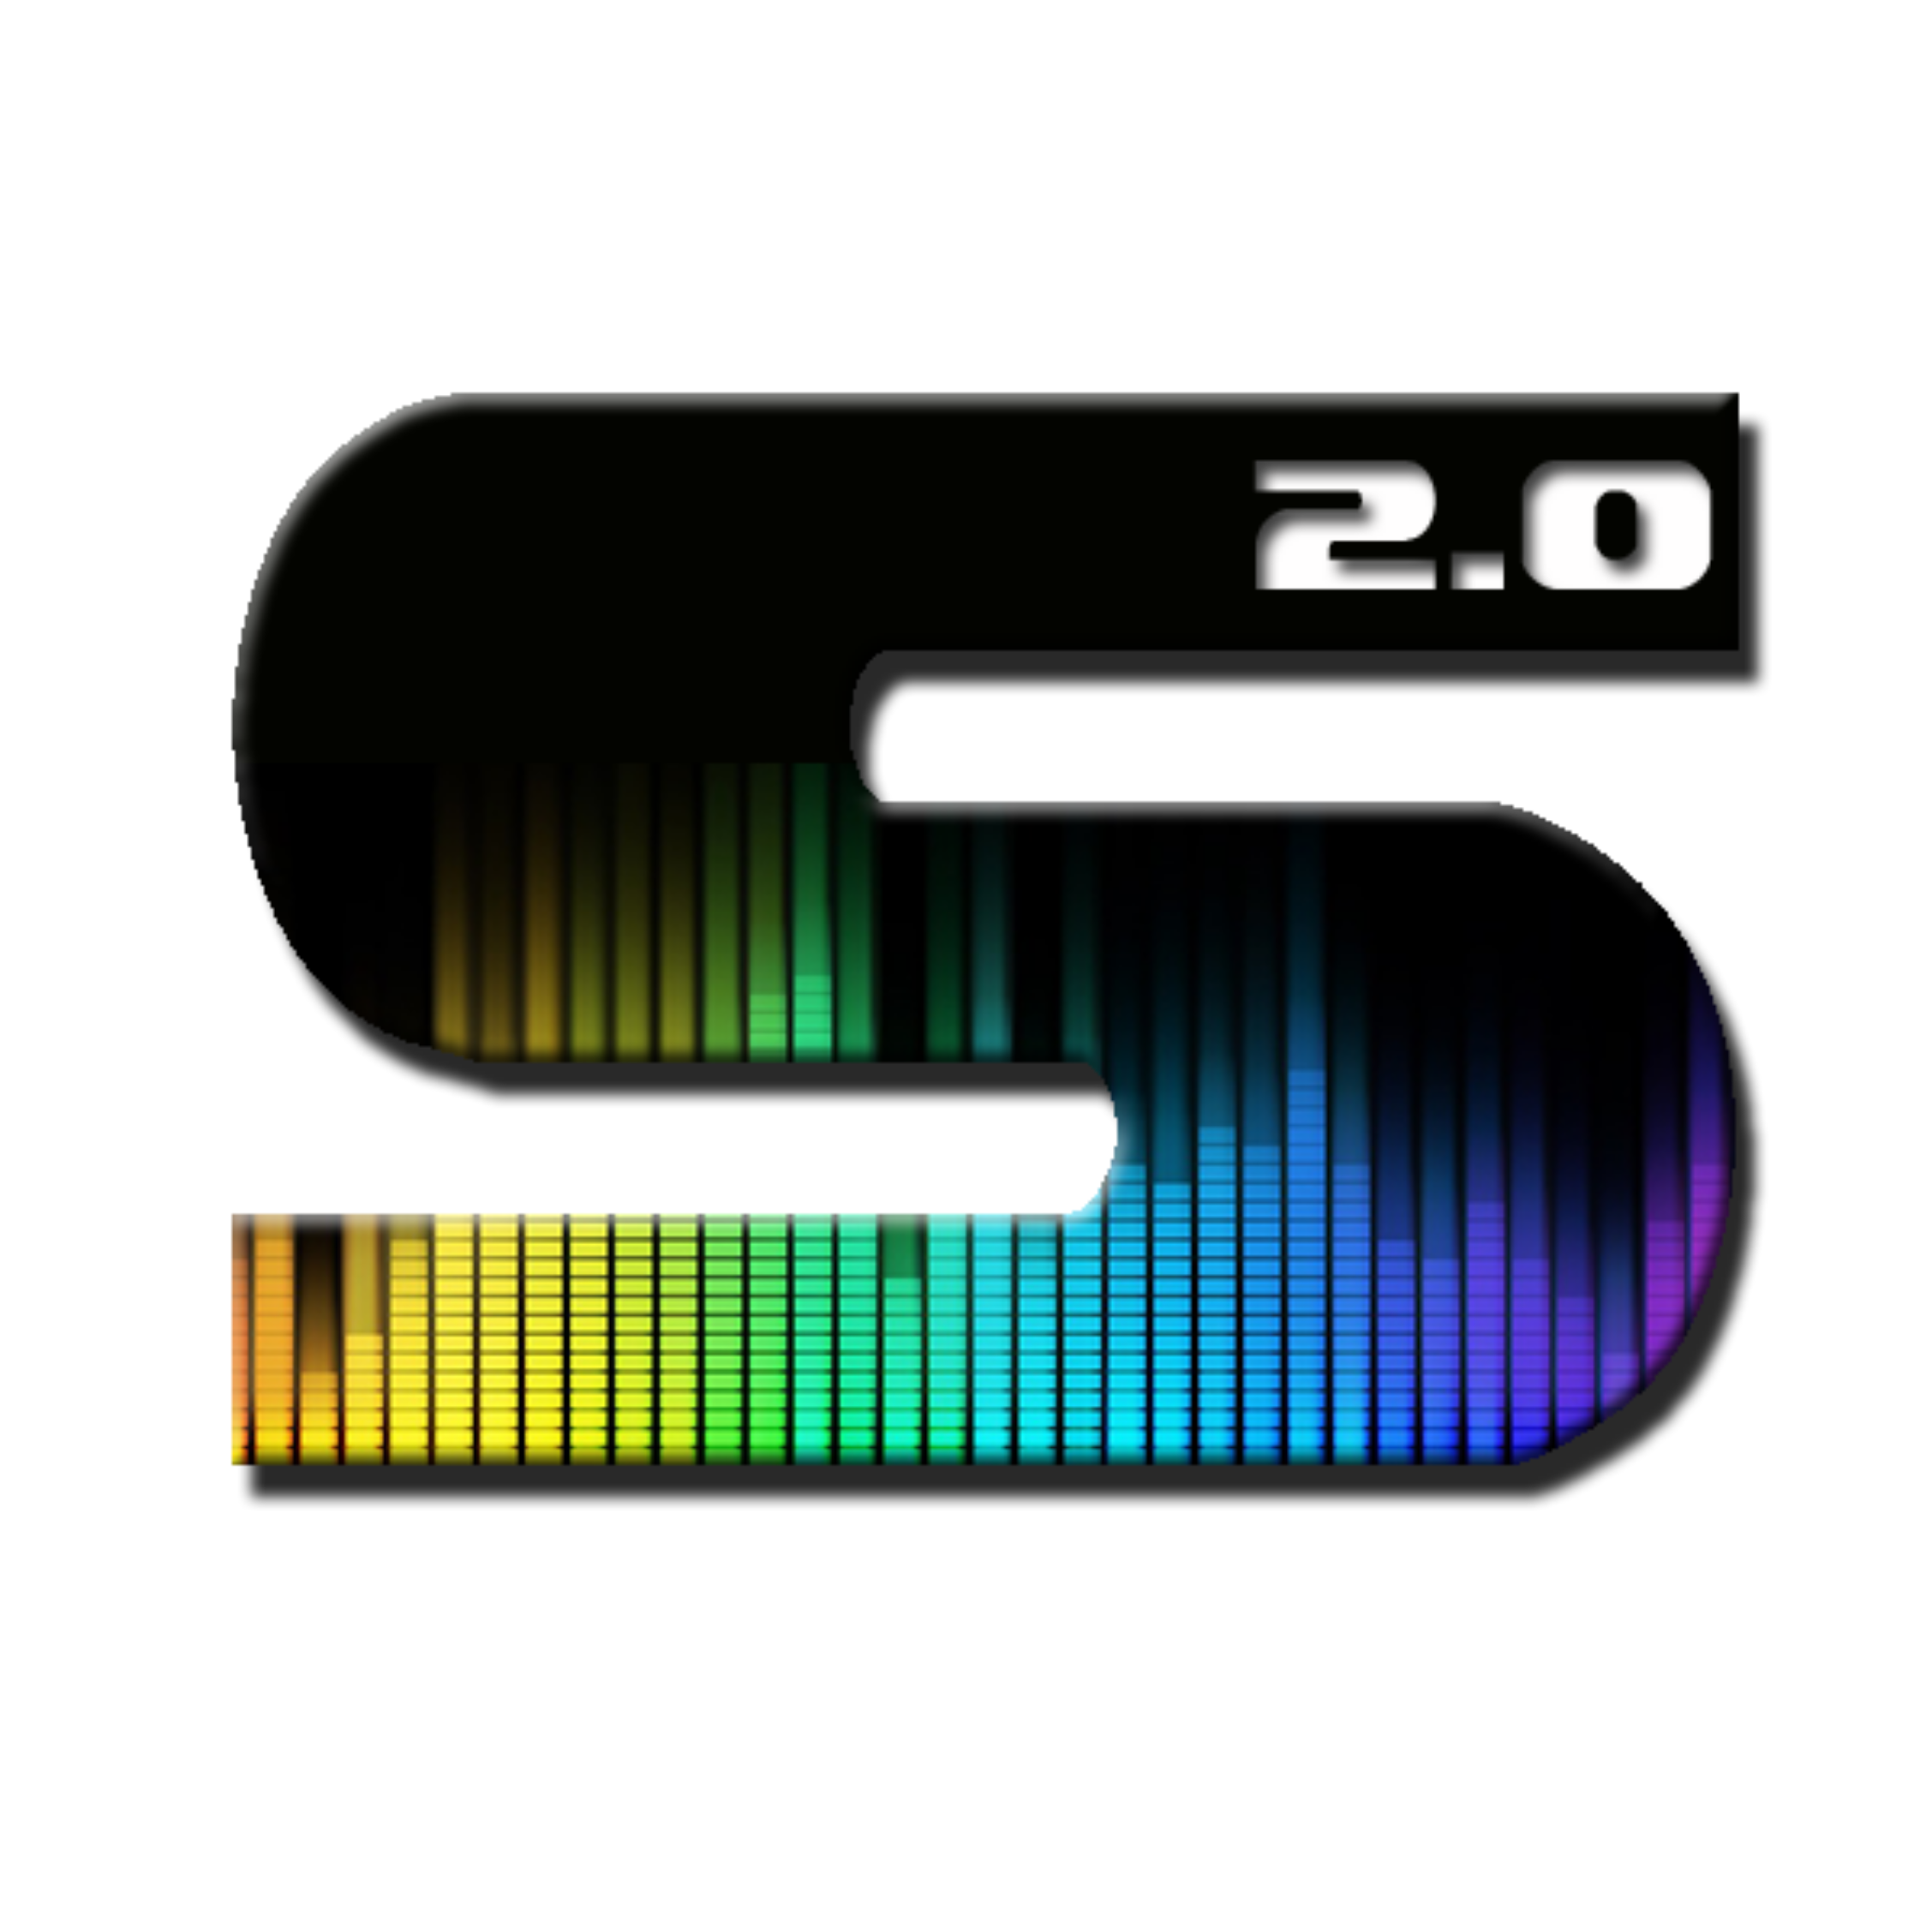 Sonora 2.0